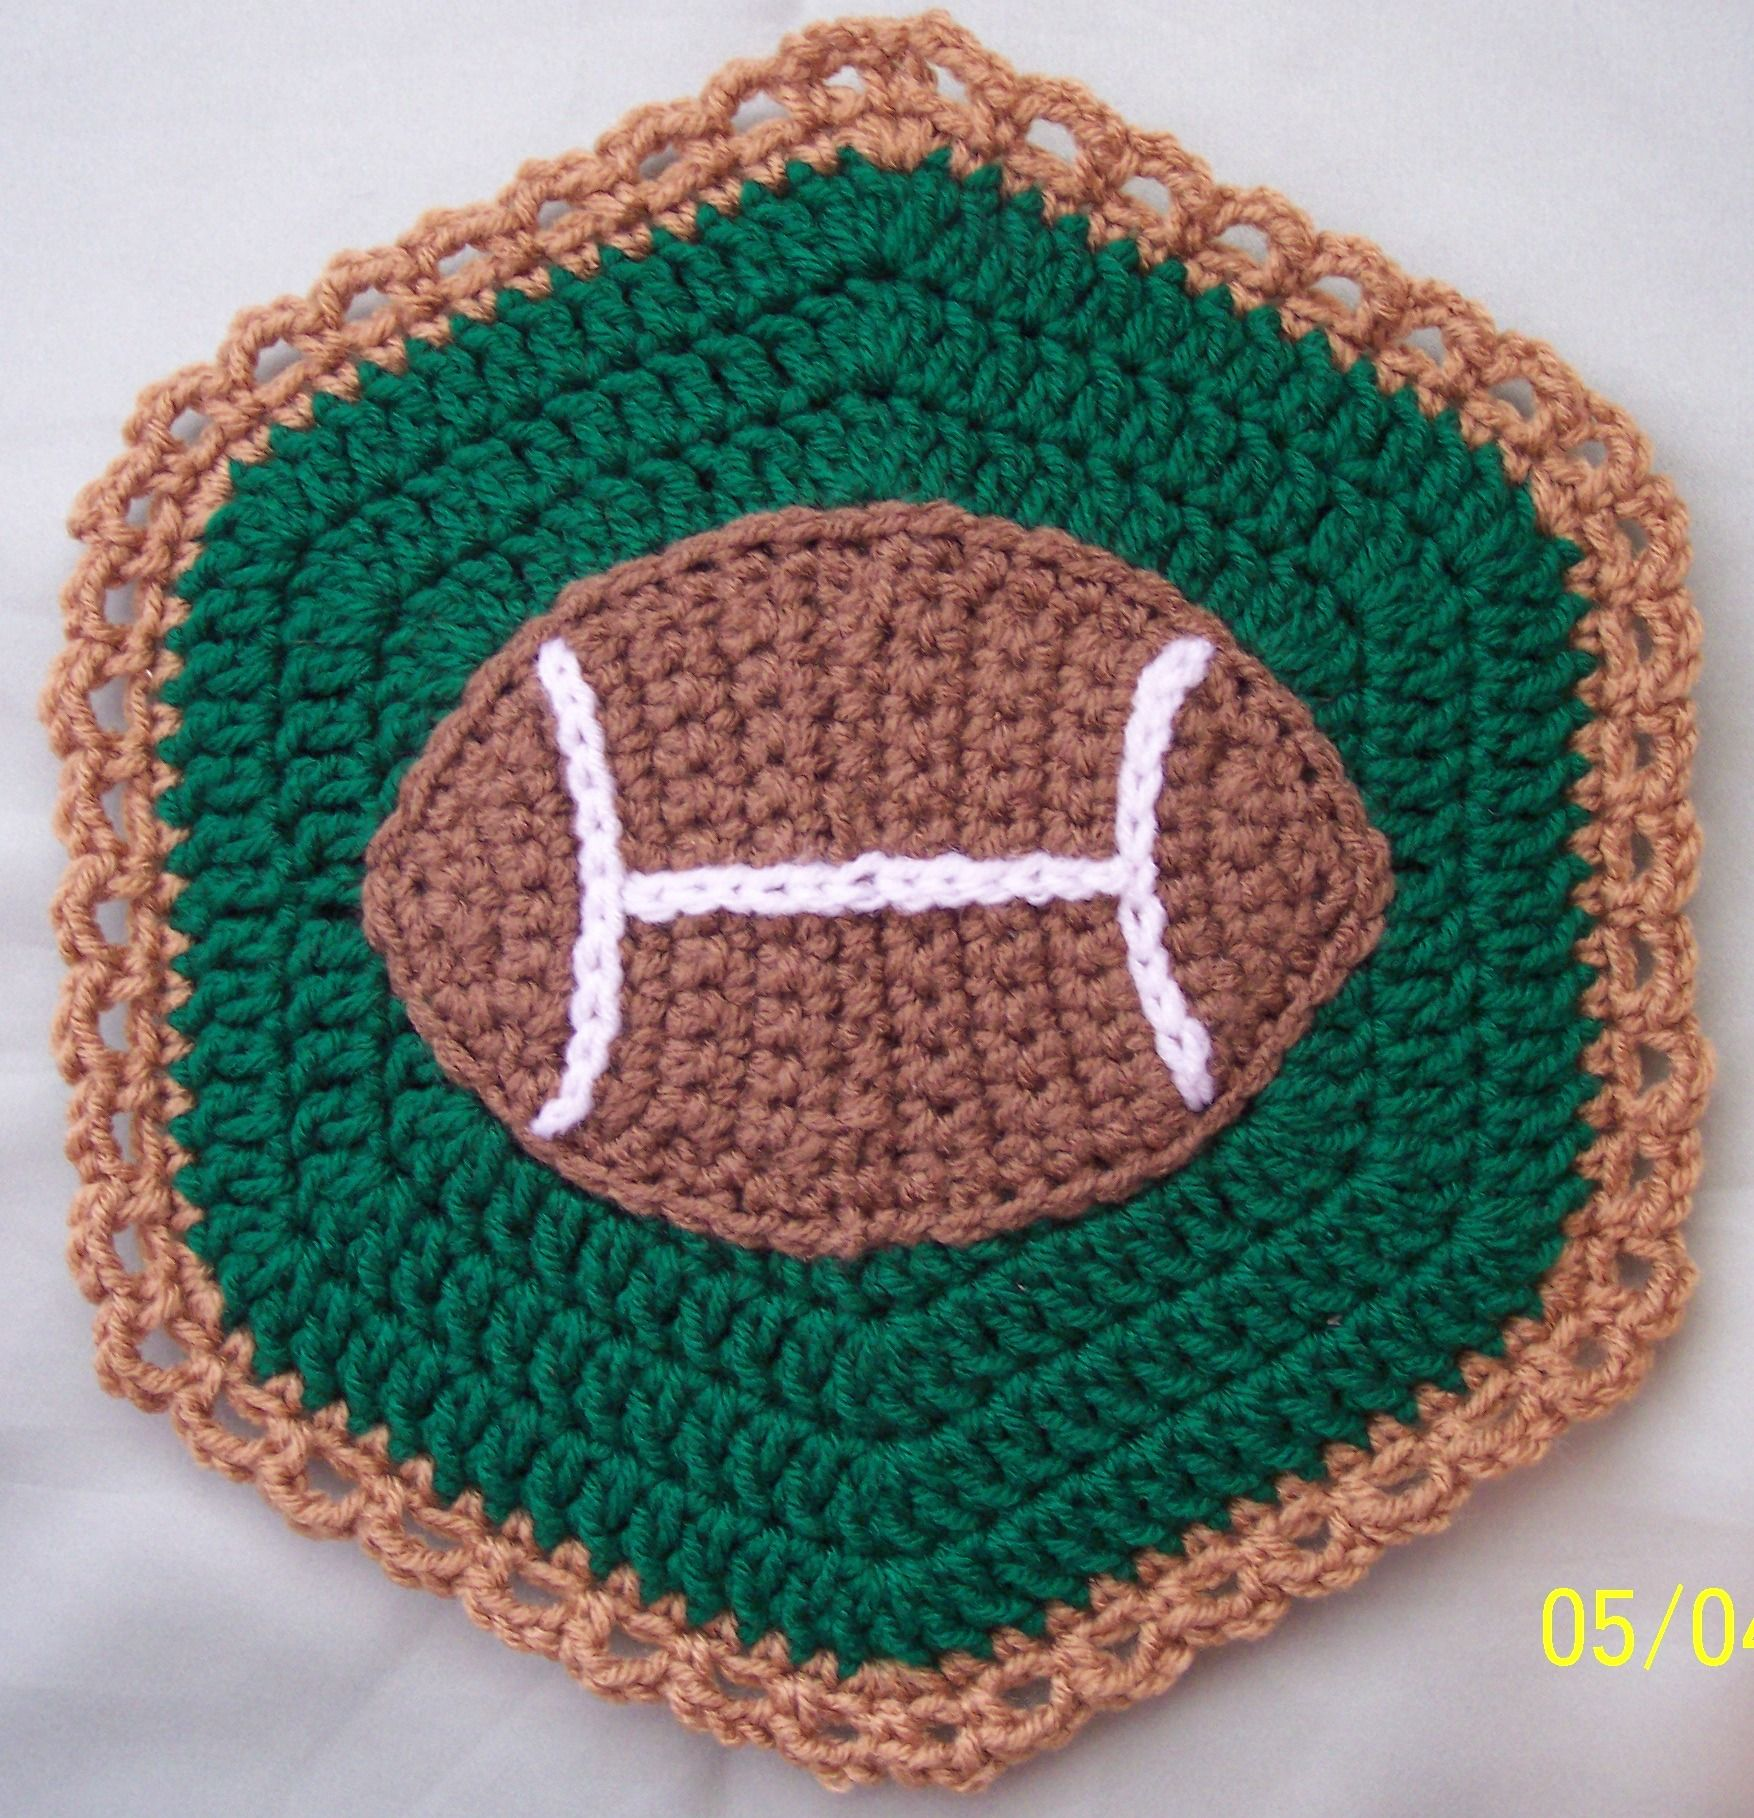 Crochet Foot Ball Potholder, by Linda Weddle